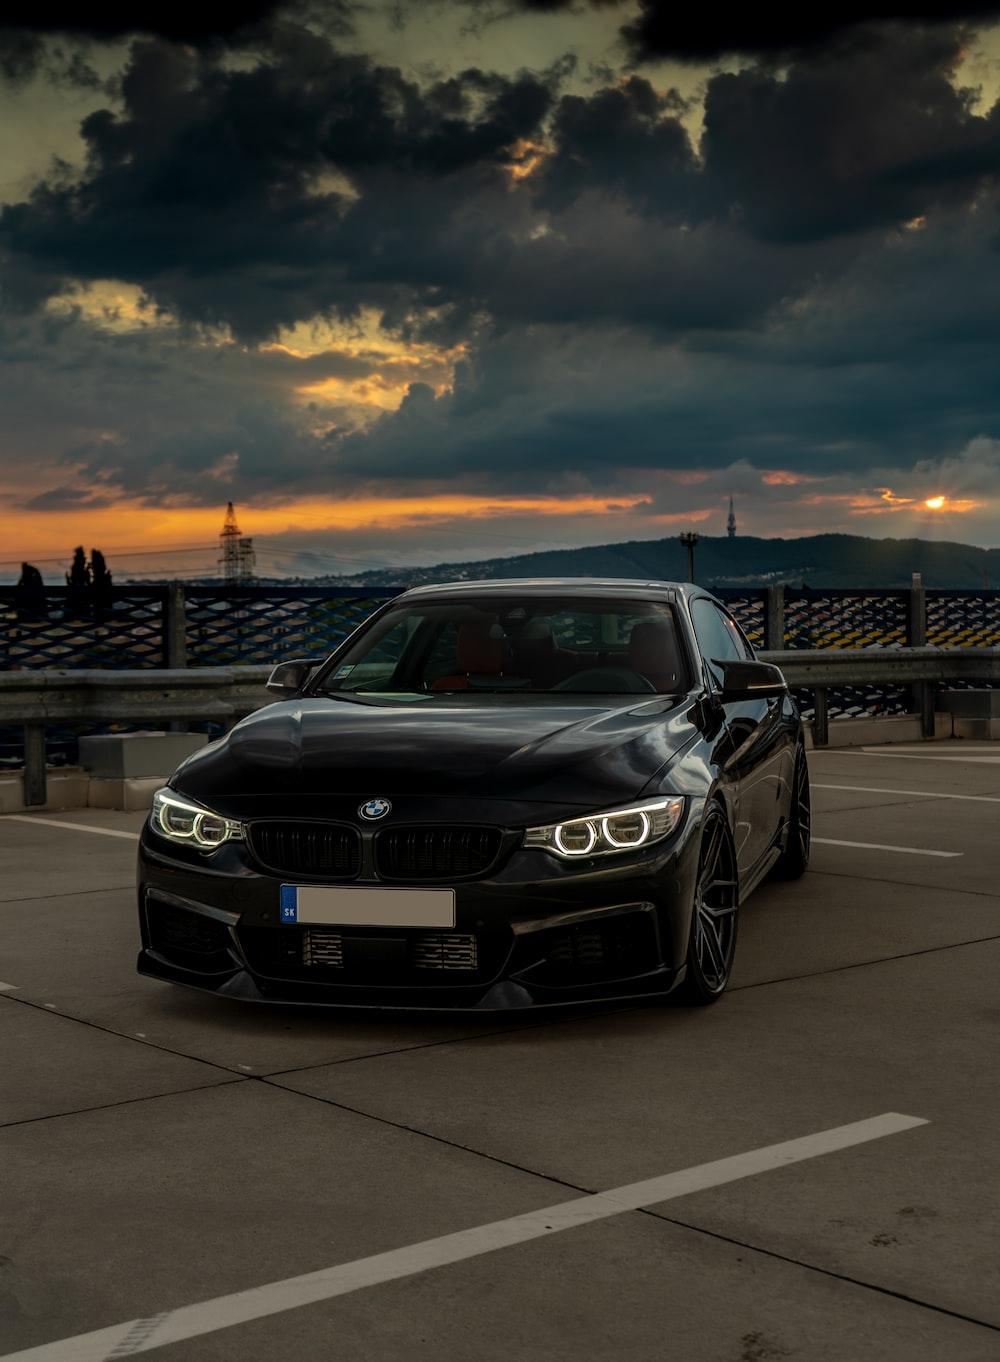 black vehicle under grey clouds